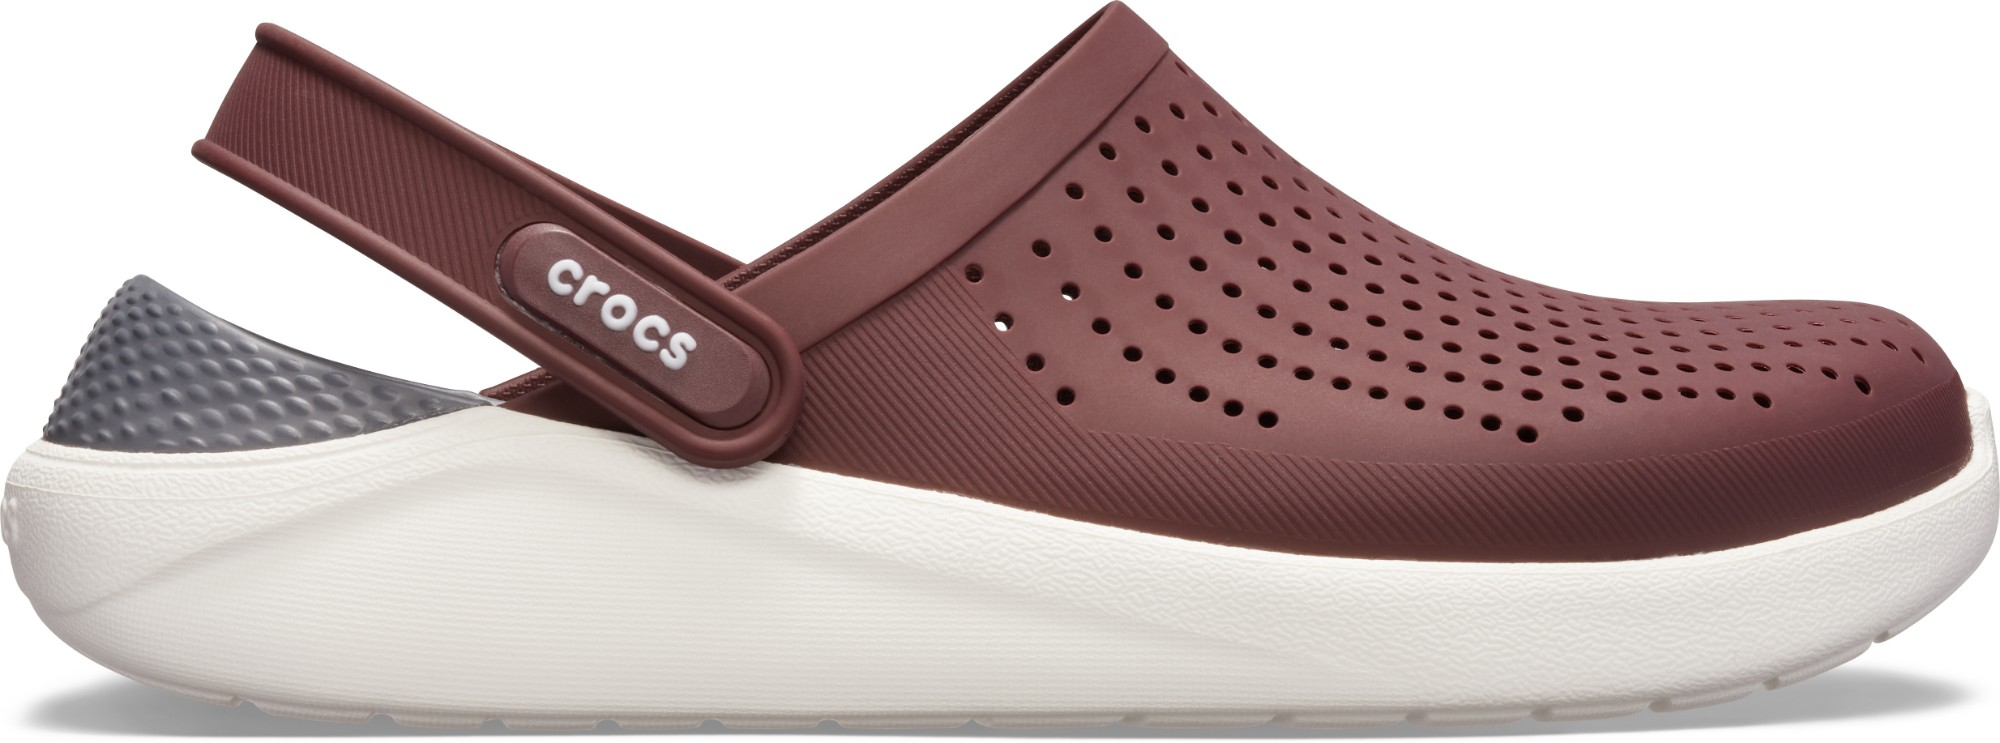 Crocs™ LiteRide Clog Burgundy/White 43,5